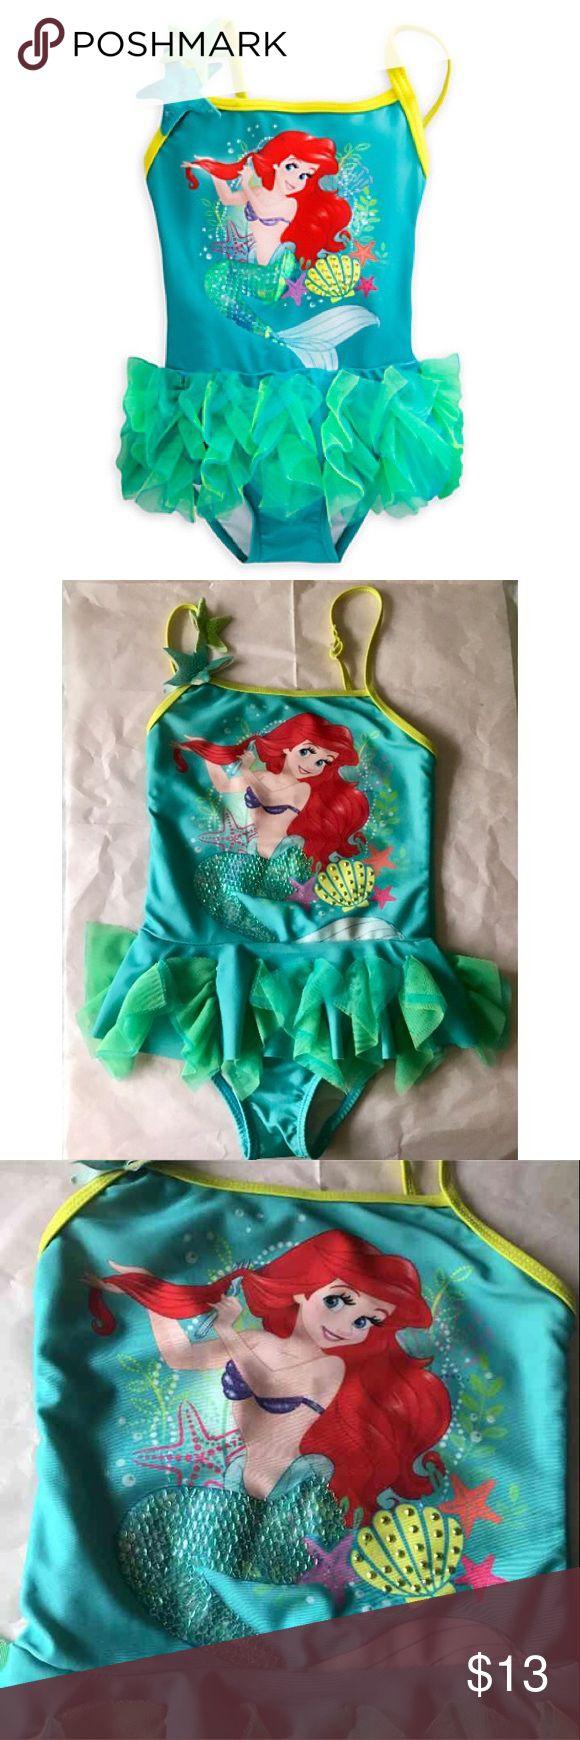 Little mermaid bathing suit Size 5/6 little girls Disney one piece. In good condition Disney Swim One Piece